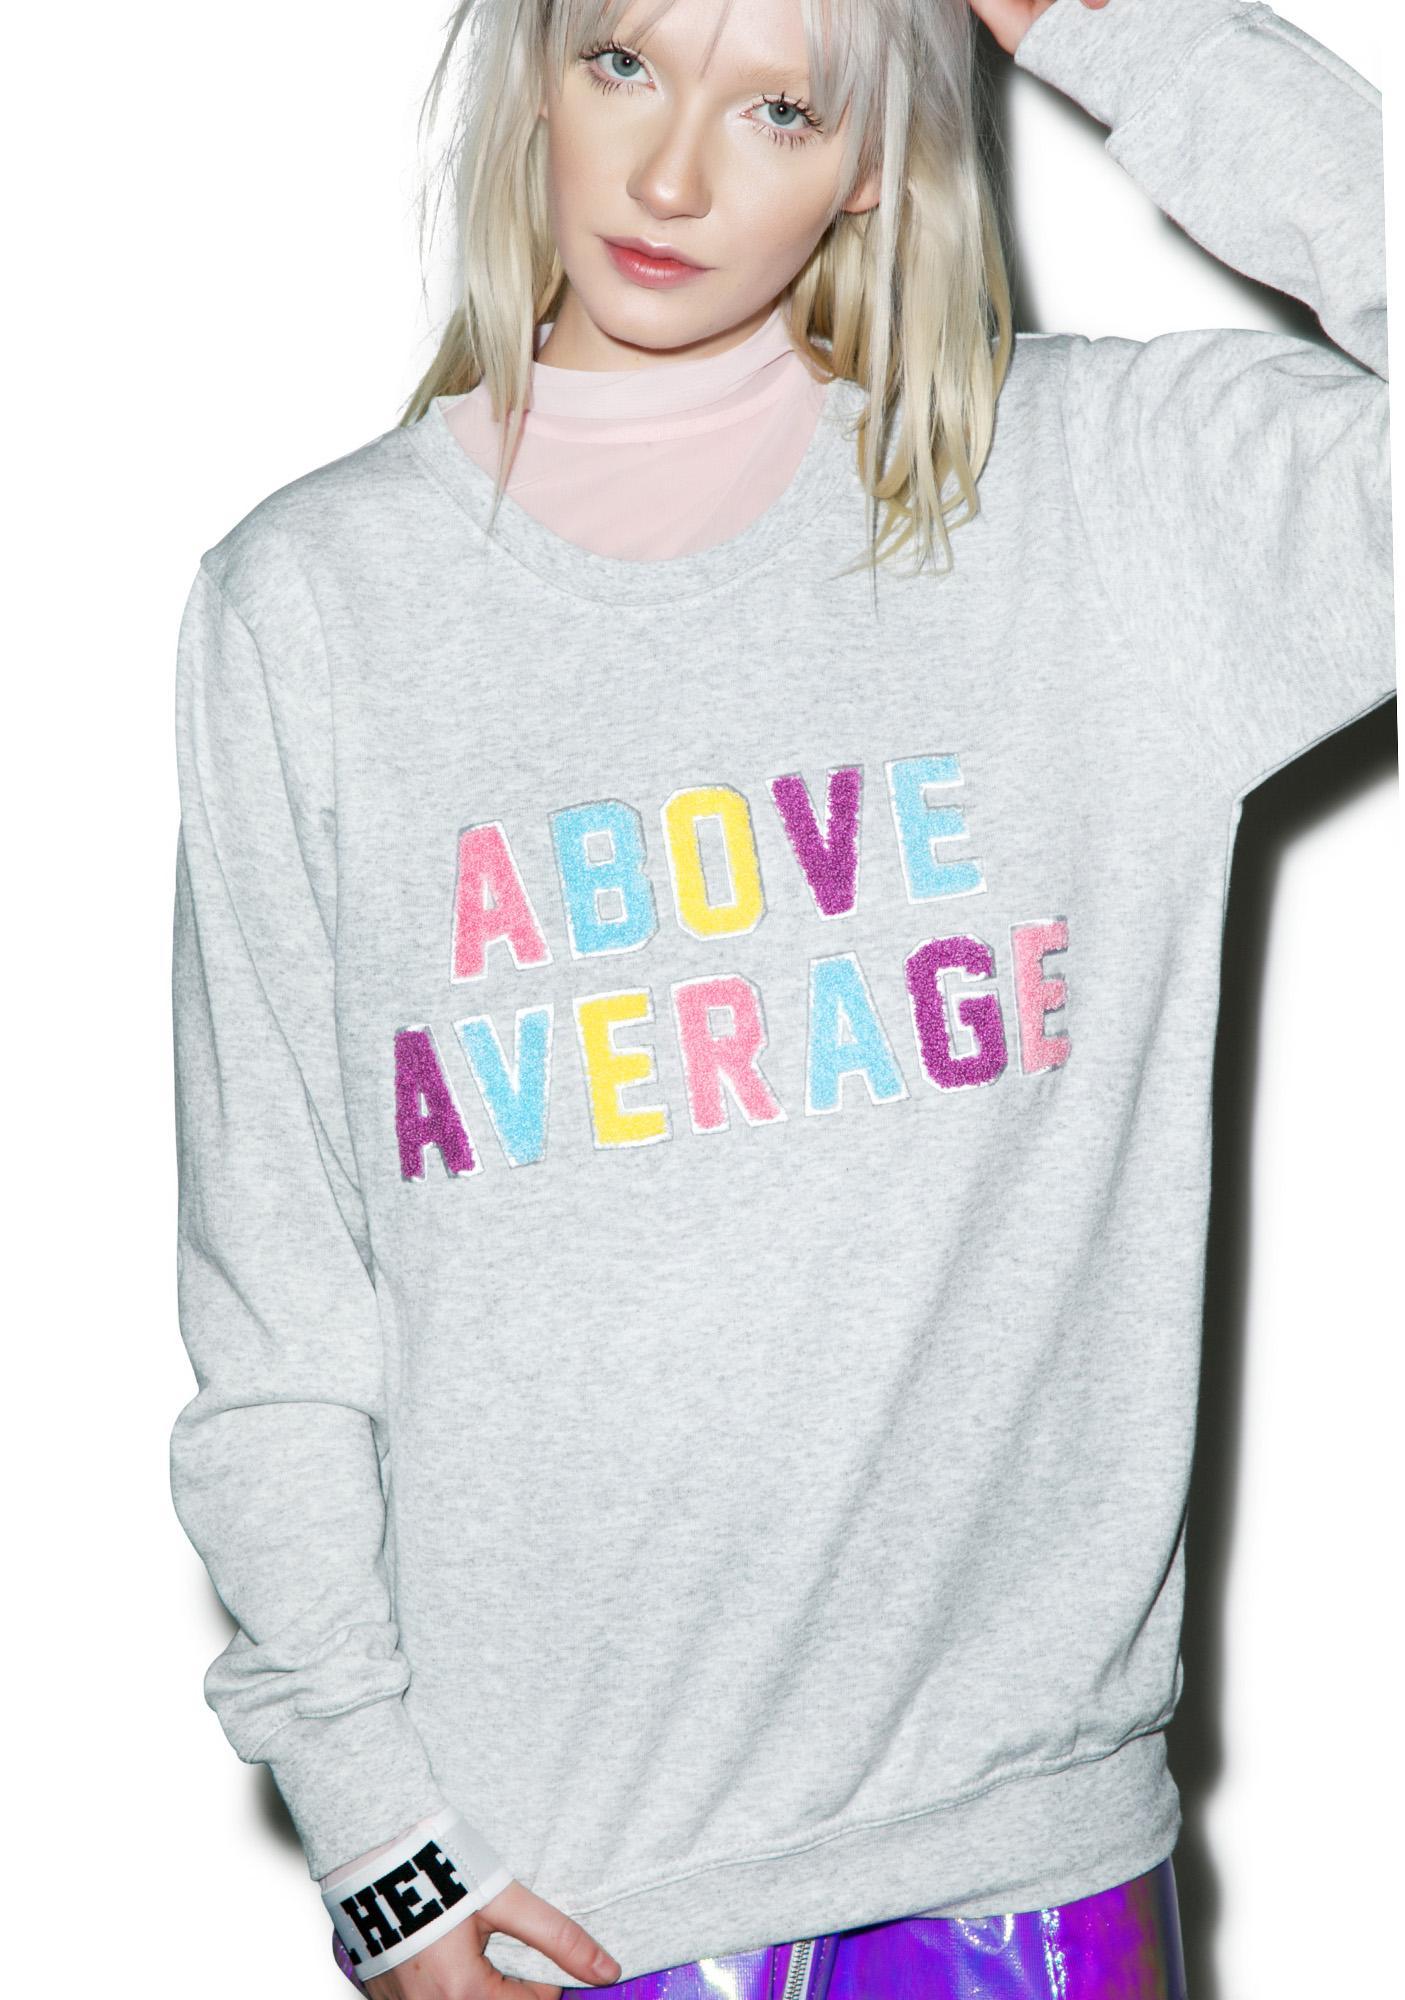 Local Heroes Above Average Sweatshirt